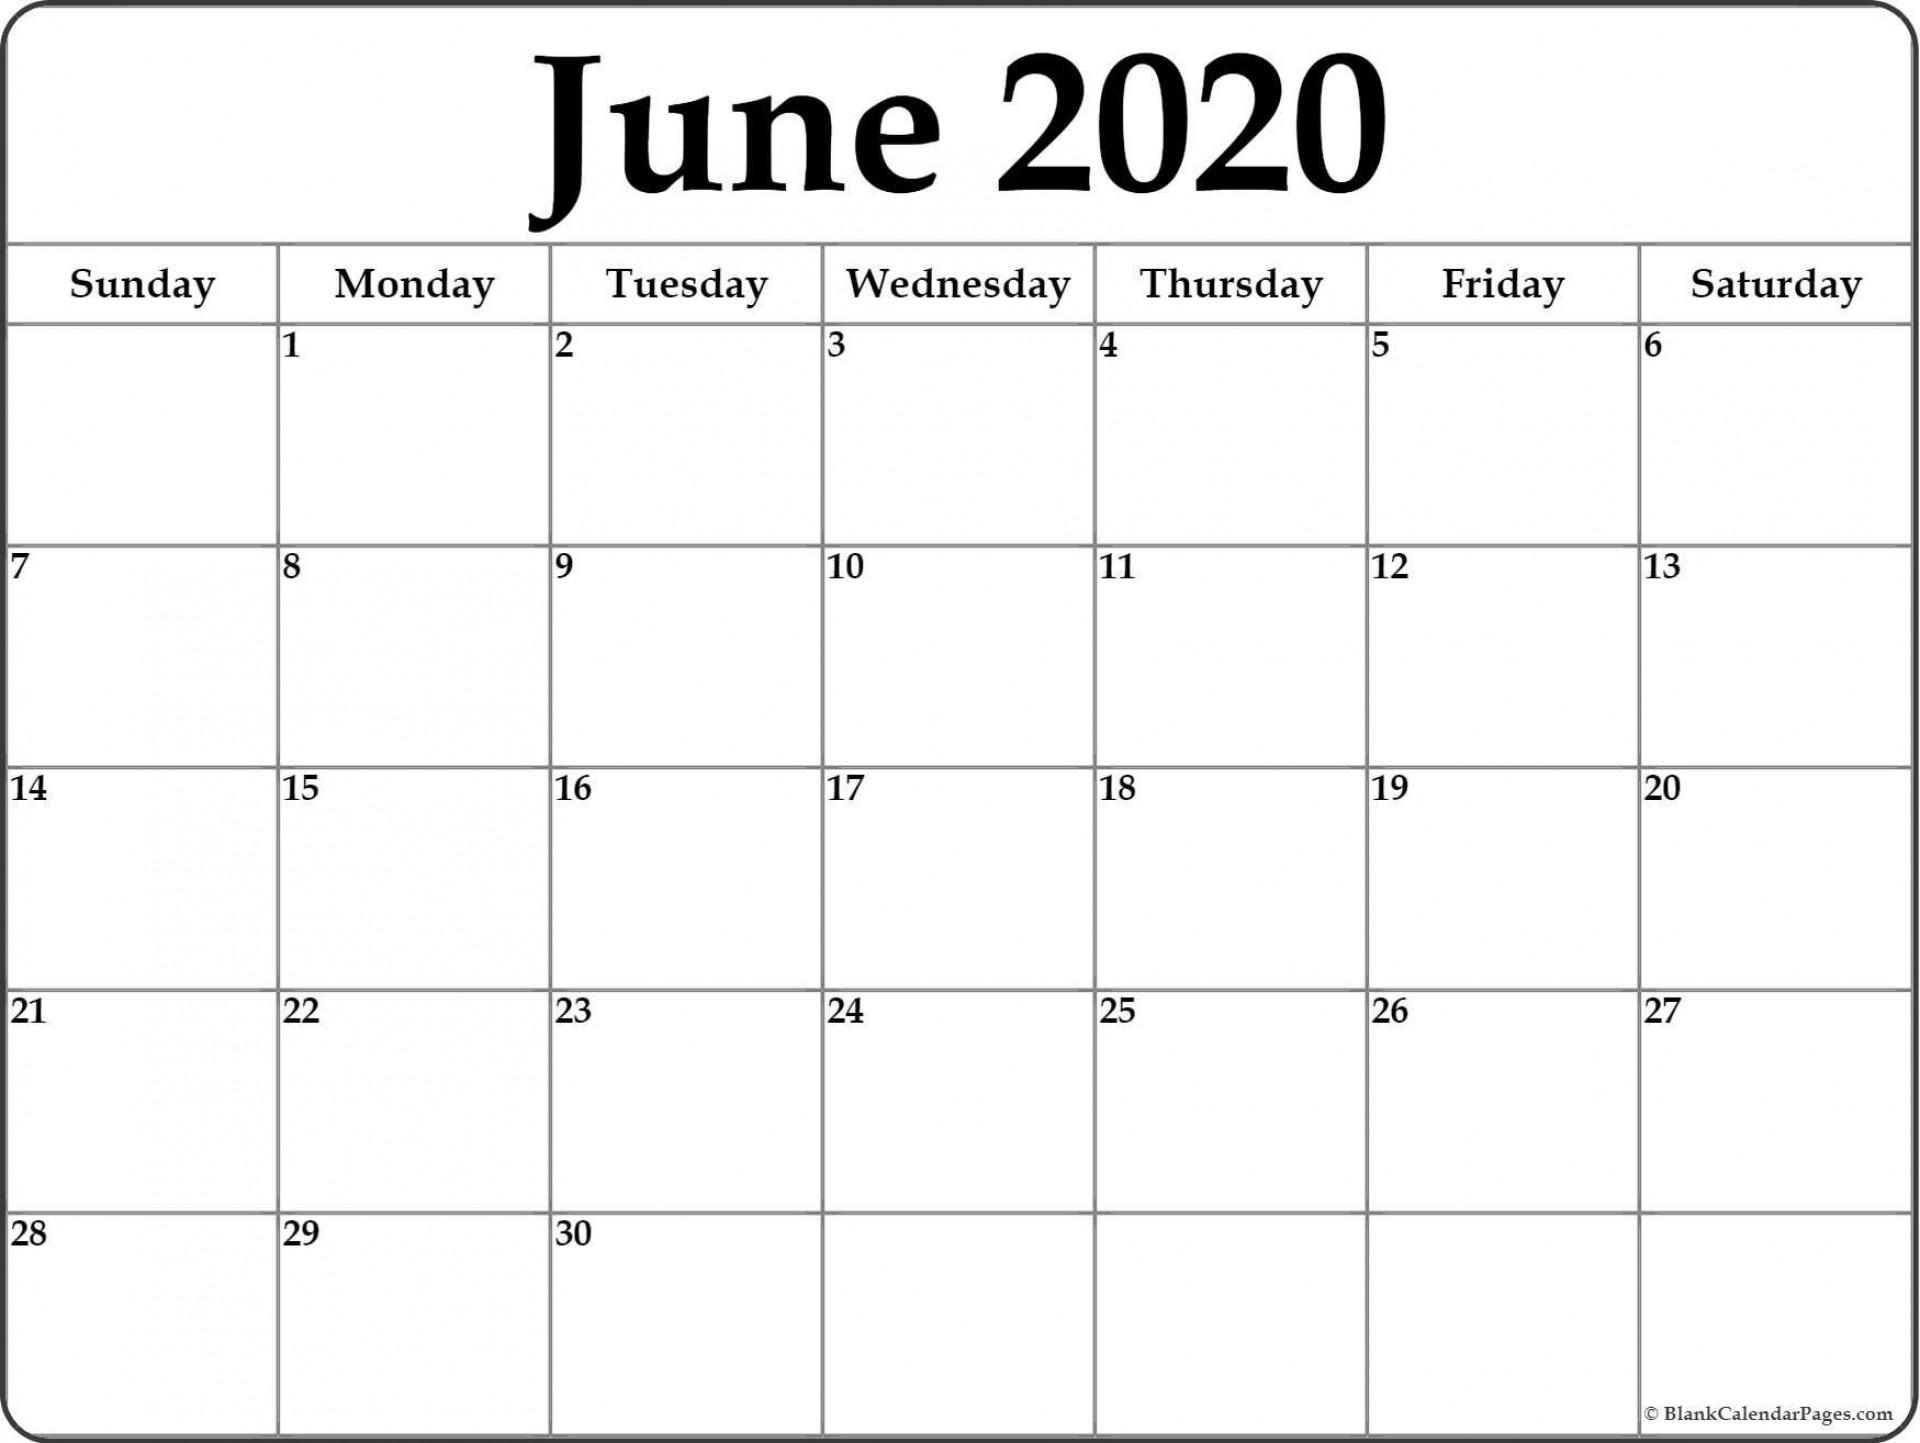 005 Top June 2020 Monthly Calendar Template Inspiration 1920